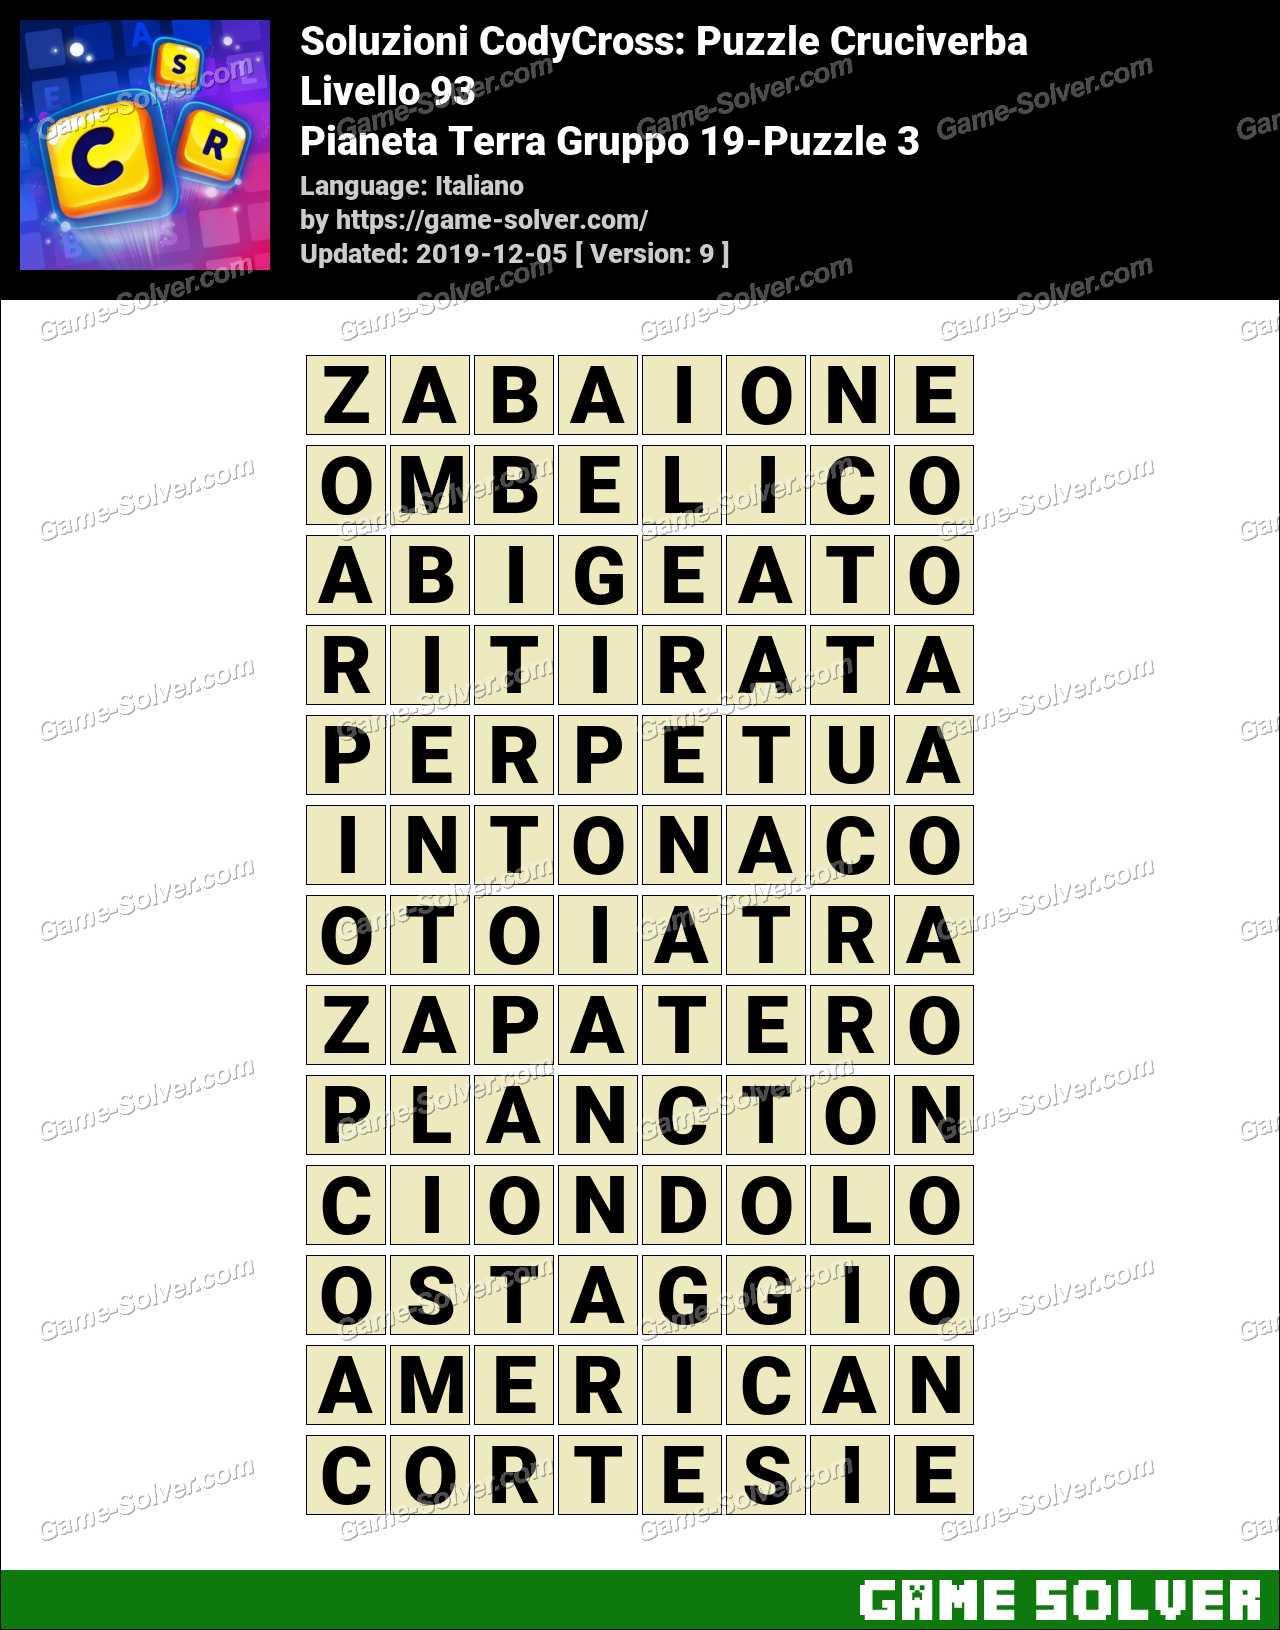 Soluzioni CodyCross Pianeta Terra Gruppo 19-Puzzle 3